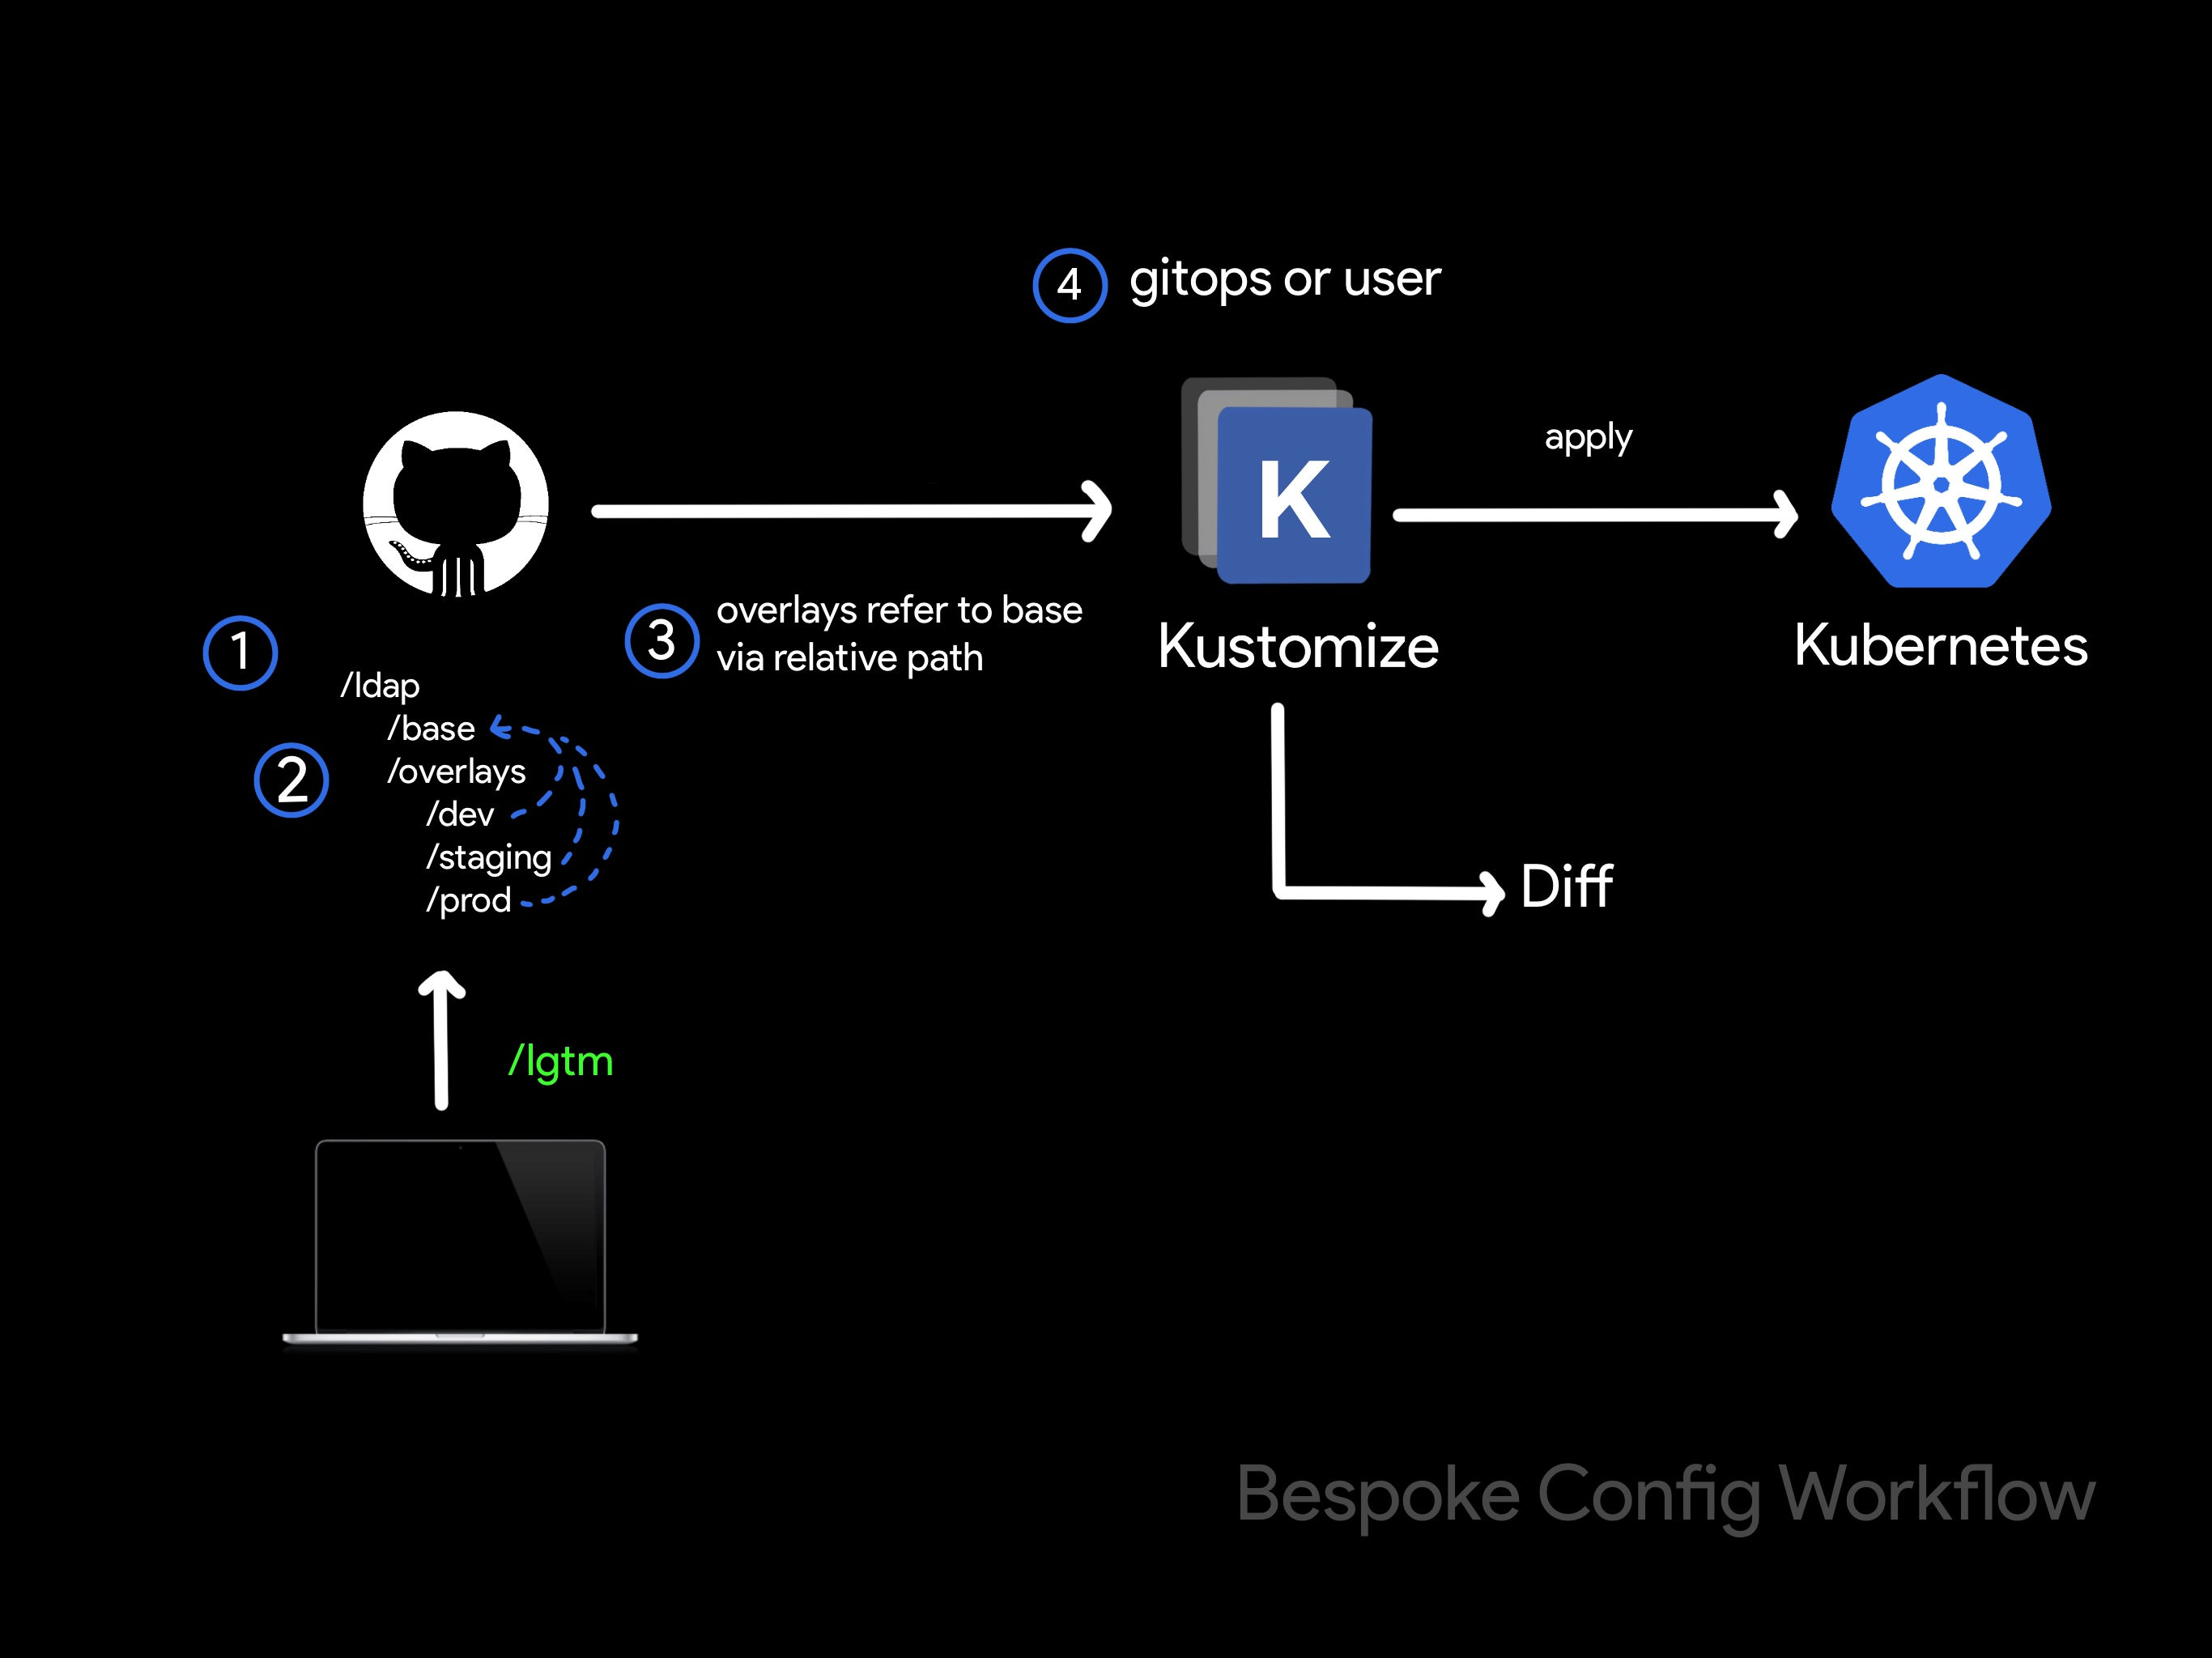 bespoke config workflow image